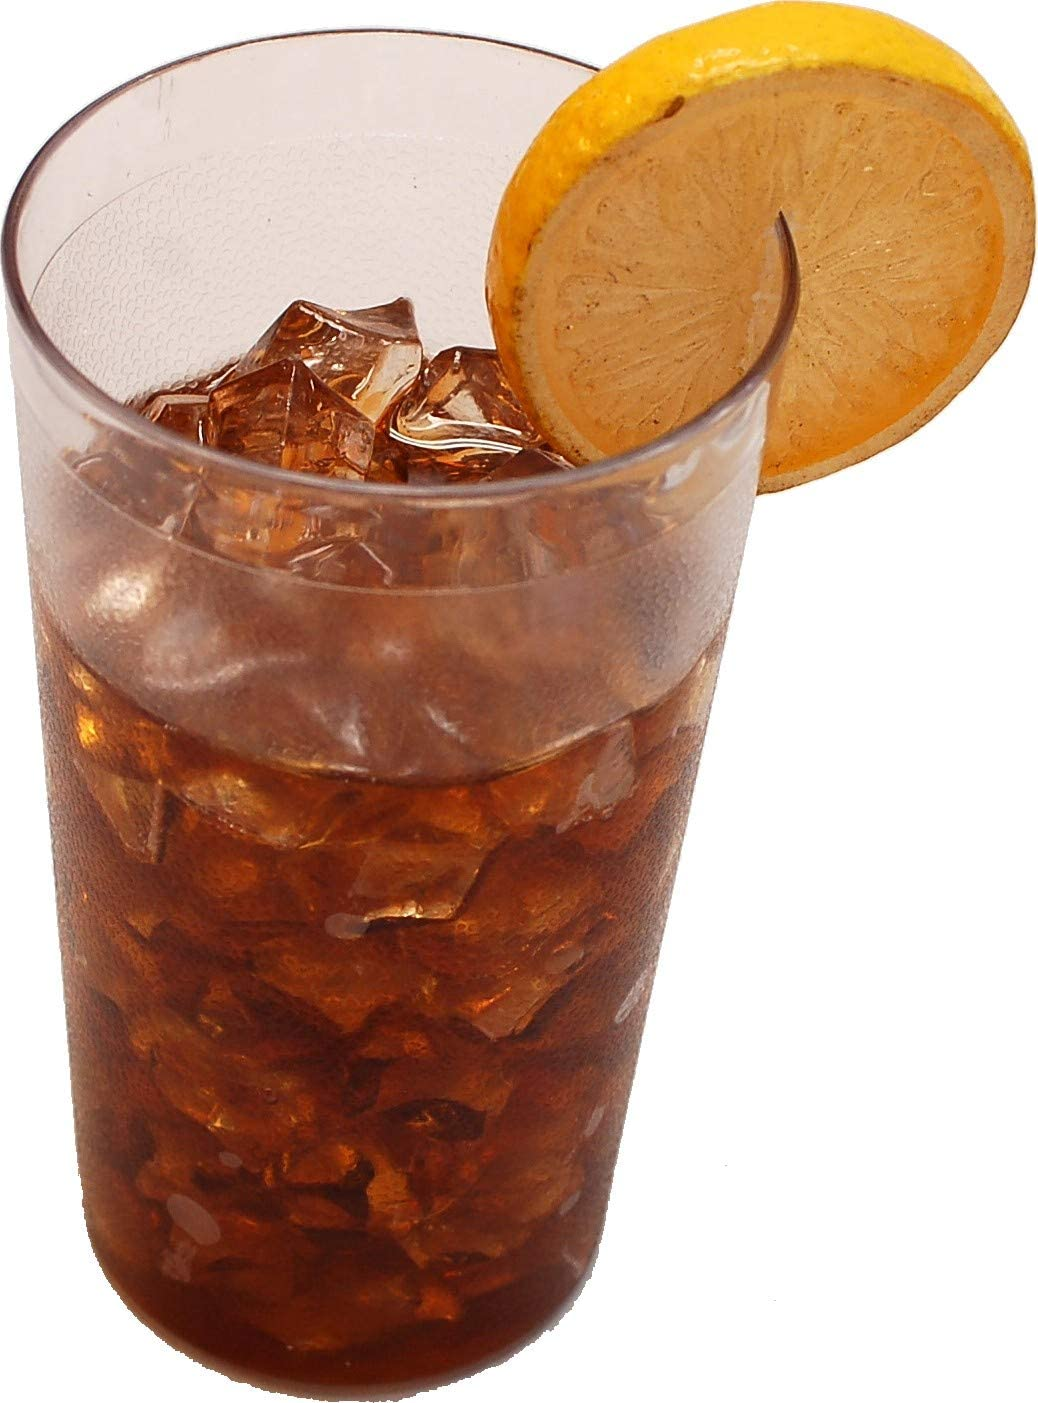 Ice Tea Fake Drink Slice Lemon Glass with Max Import 77% OFF